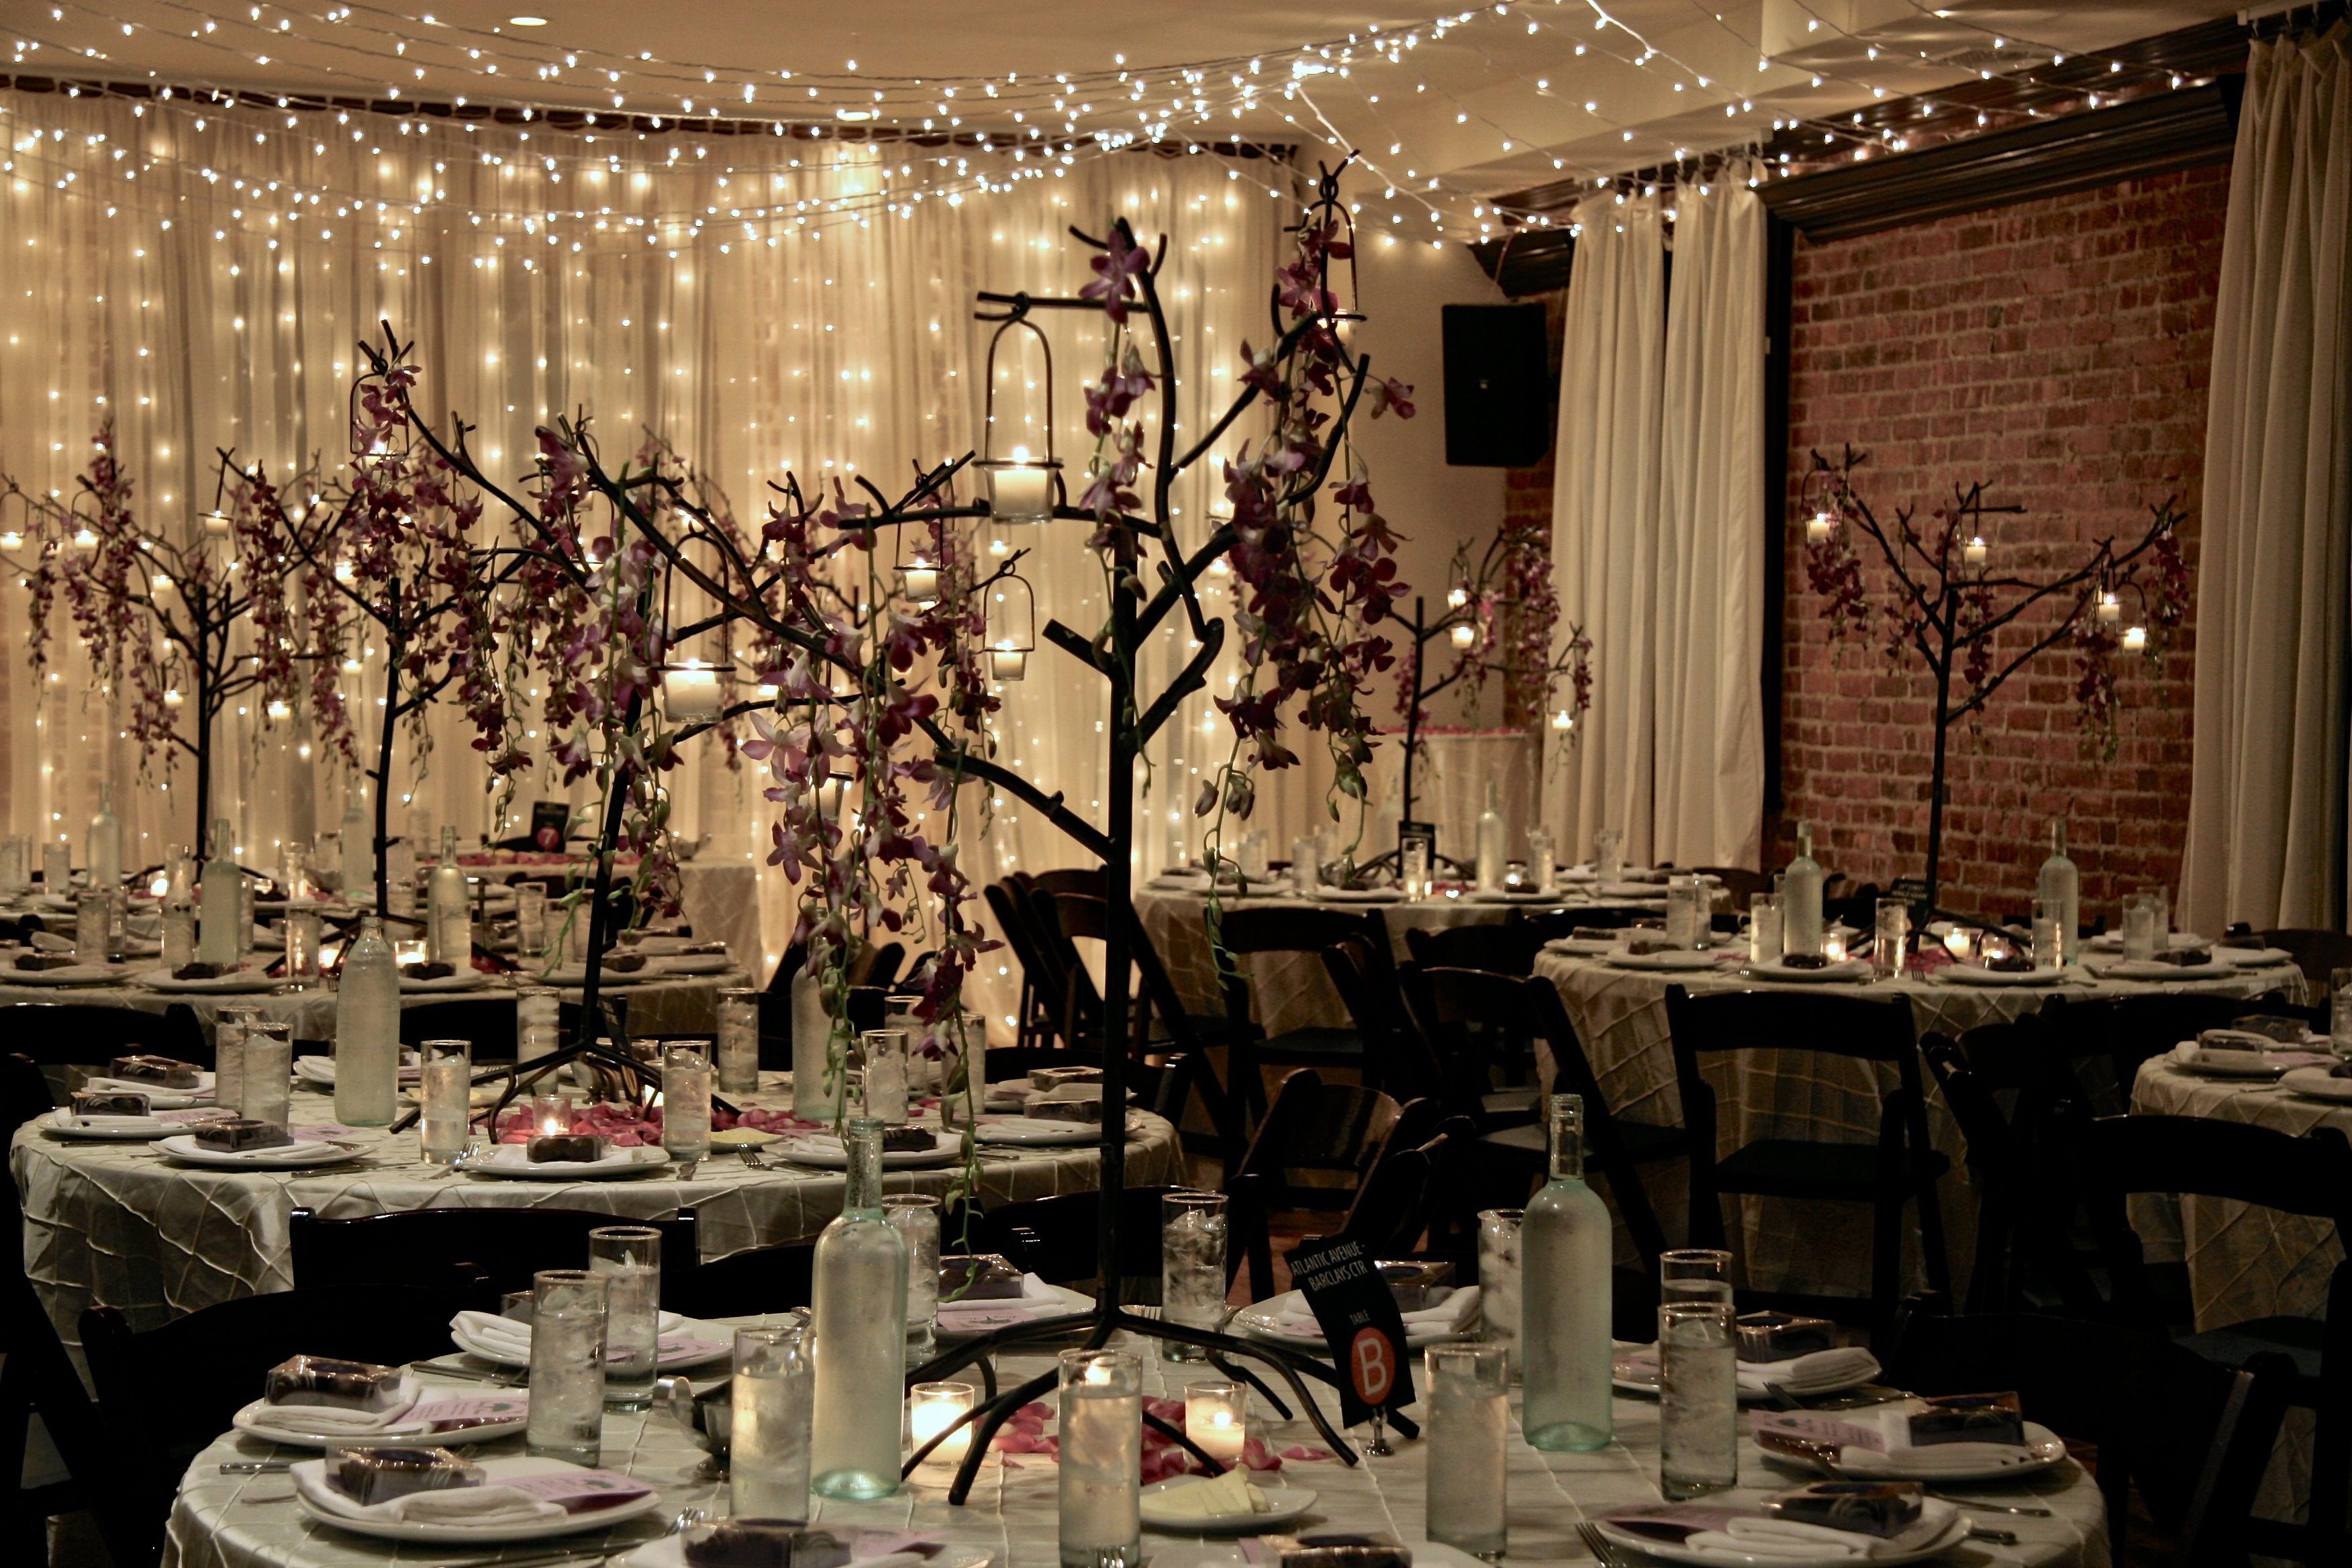 Brooklyn wedding venue orchid trees deity nyc brooklynwedding brooklyn wedding venue orchid trees deity nyc brooklynwedding brooklynweddingvenue bkweddingexpo junglespirit Images